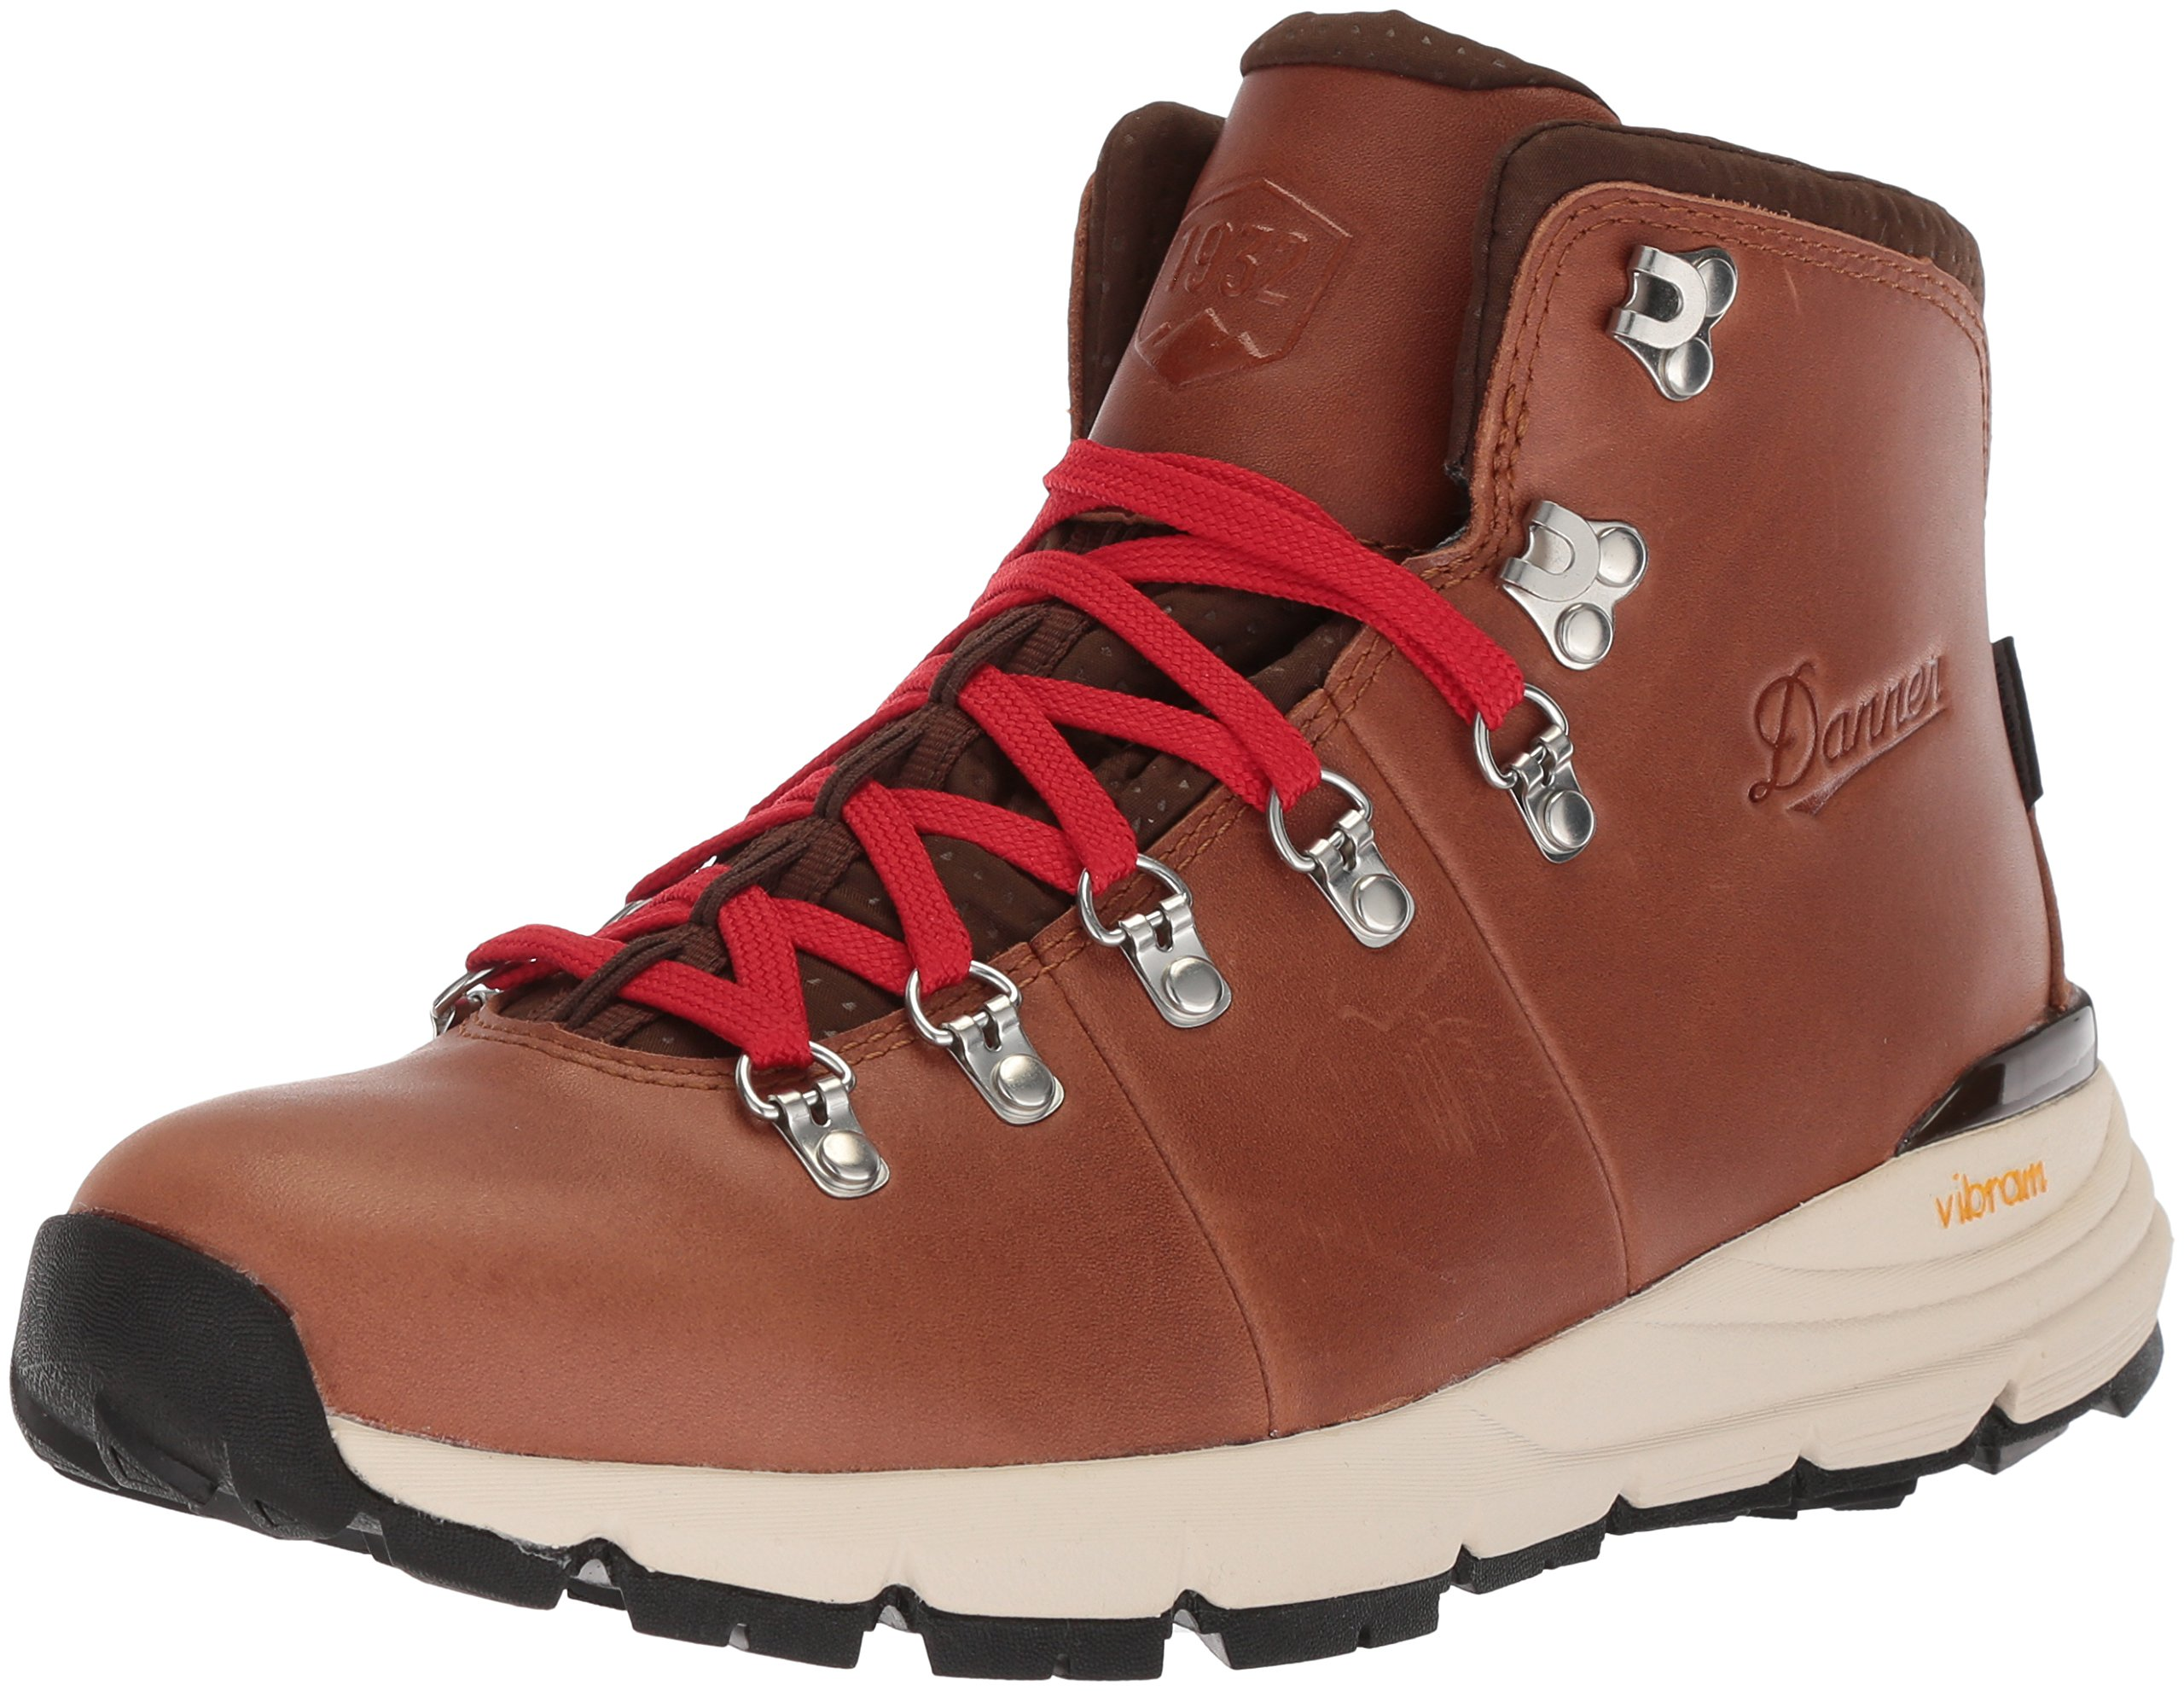 Danner Women's Mountain 600 4.5''-W's Hiking Boot Saddle Tan 8 M US